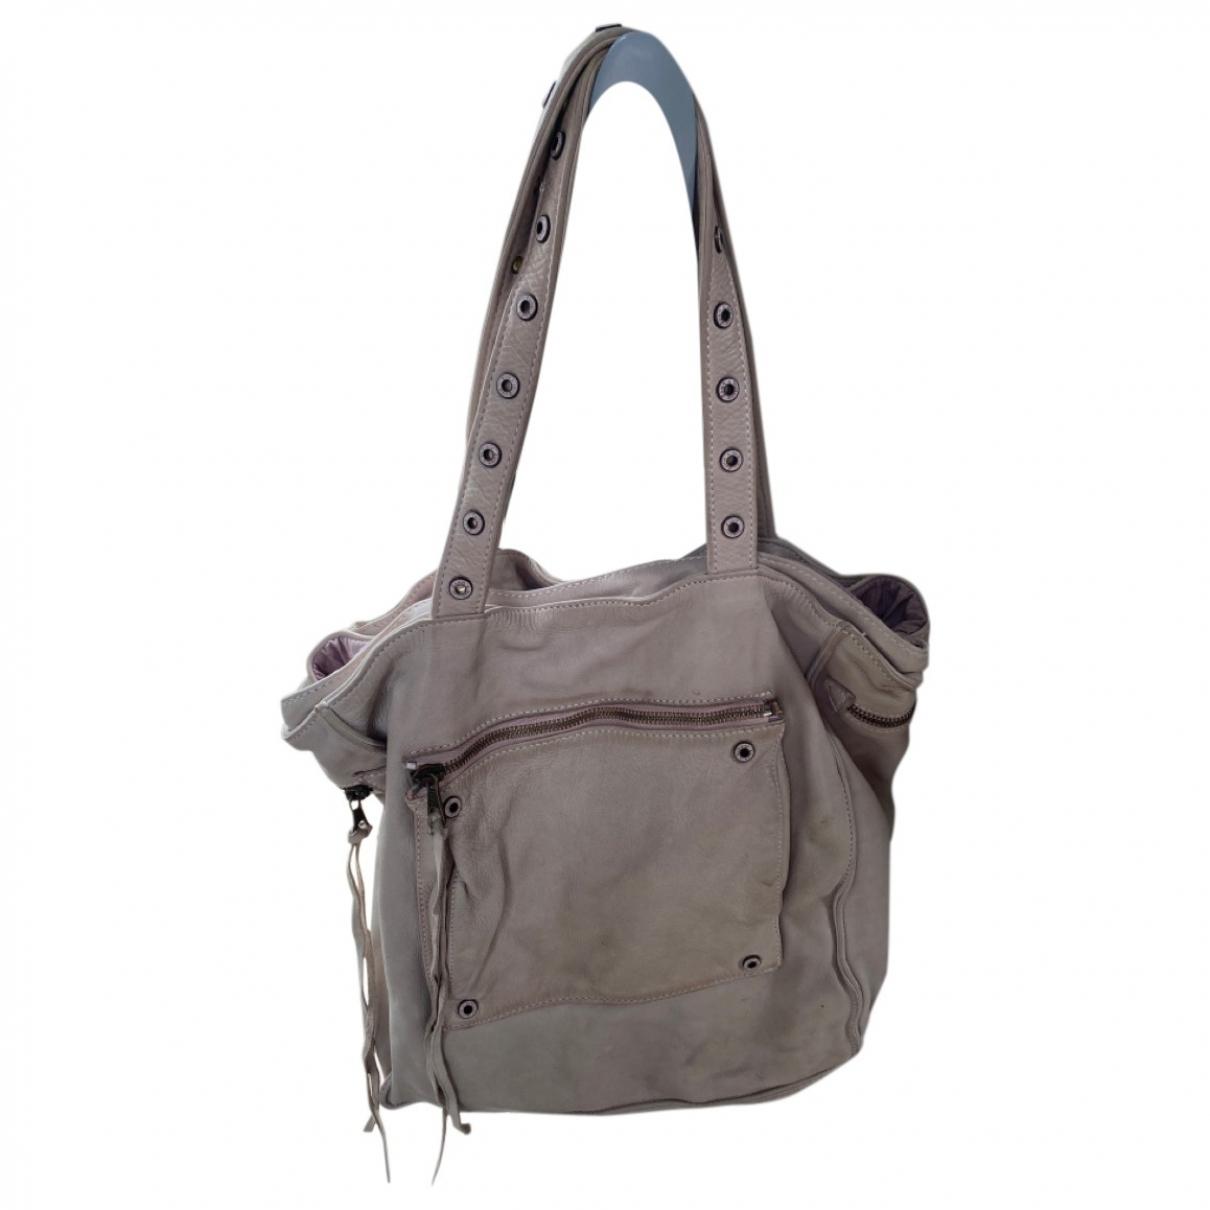 Zadig & Voltaire \N Beige Leather handbag for Women \N